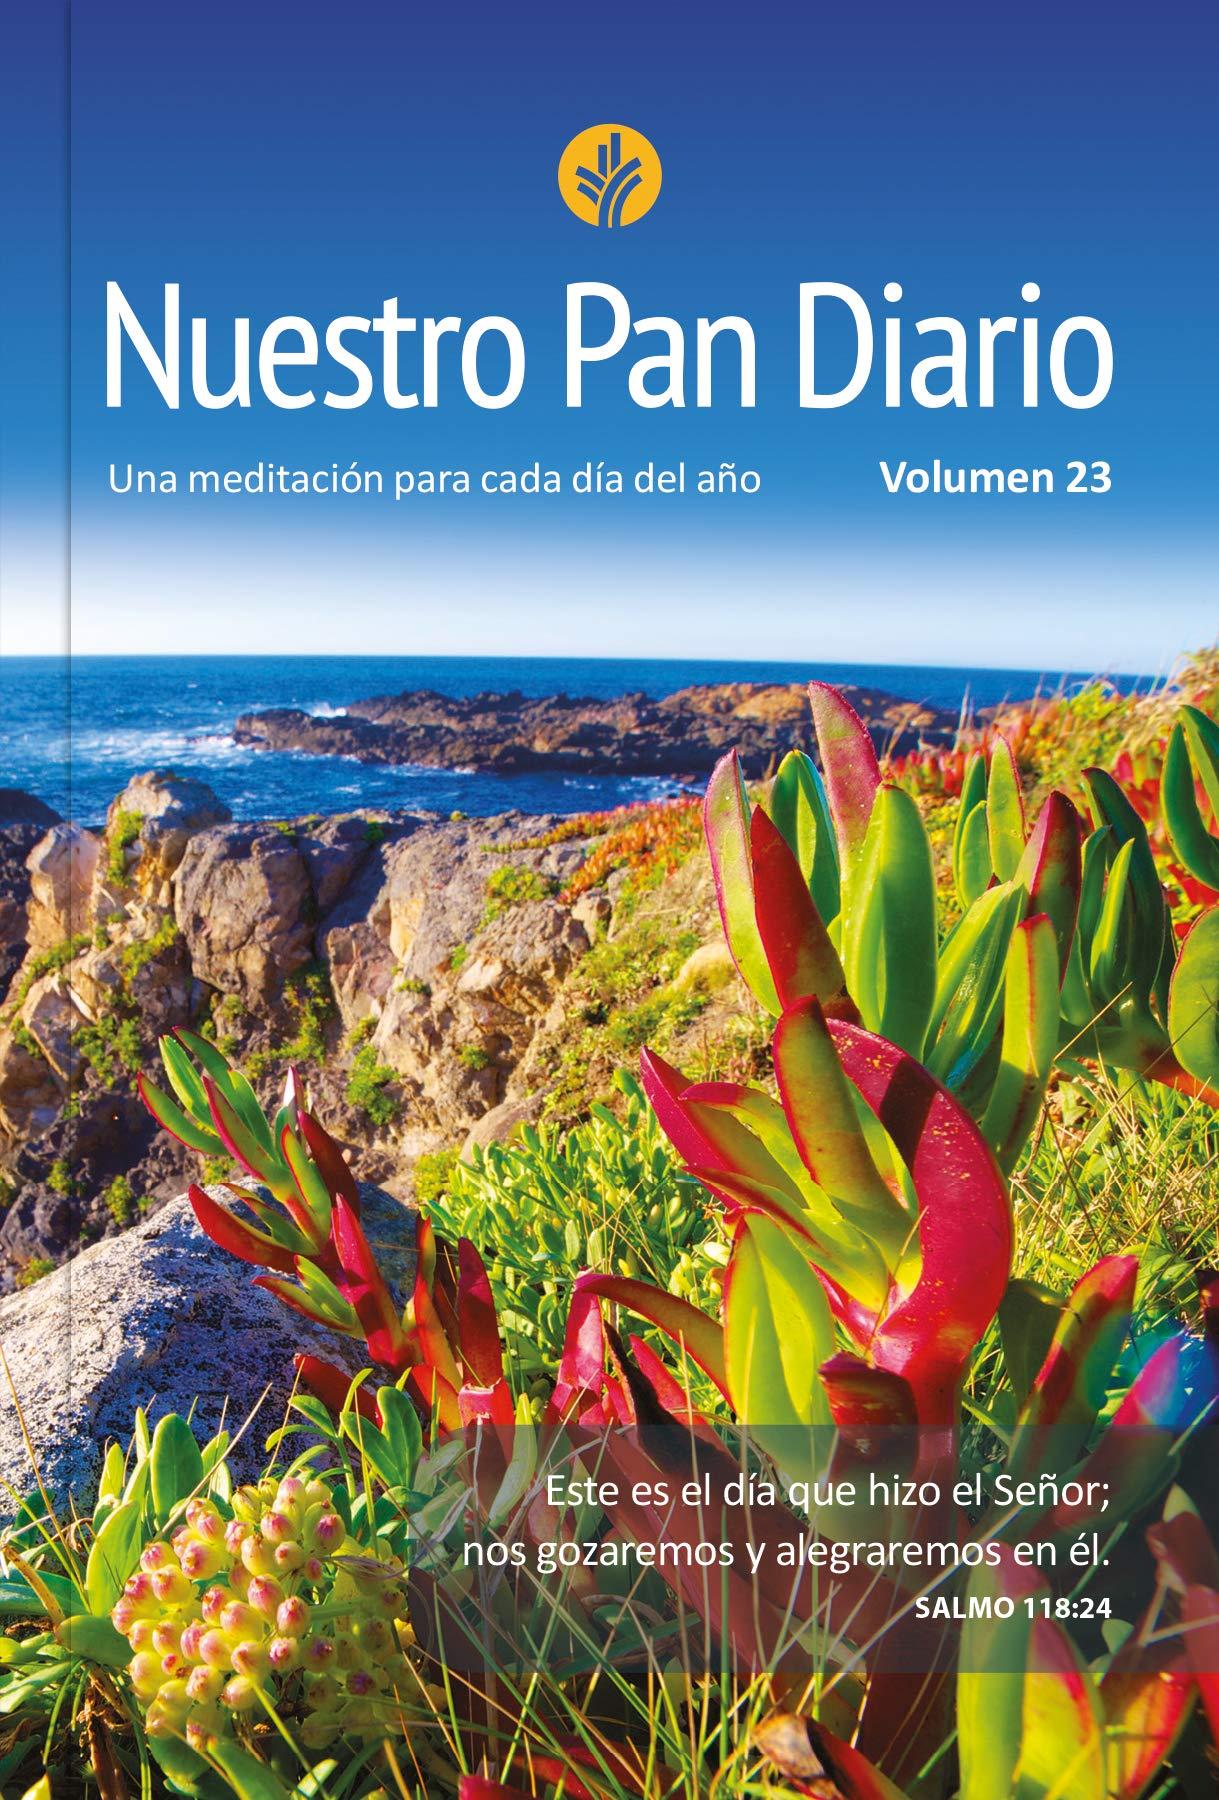 Nuestro Pan Diario 2019 (Our Daily Bread 2019 Devotional ...